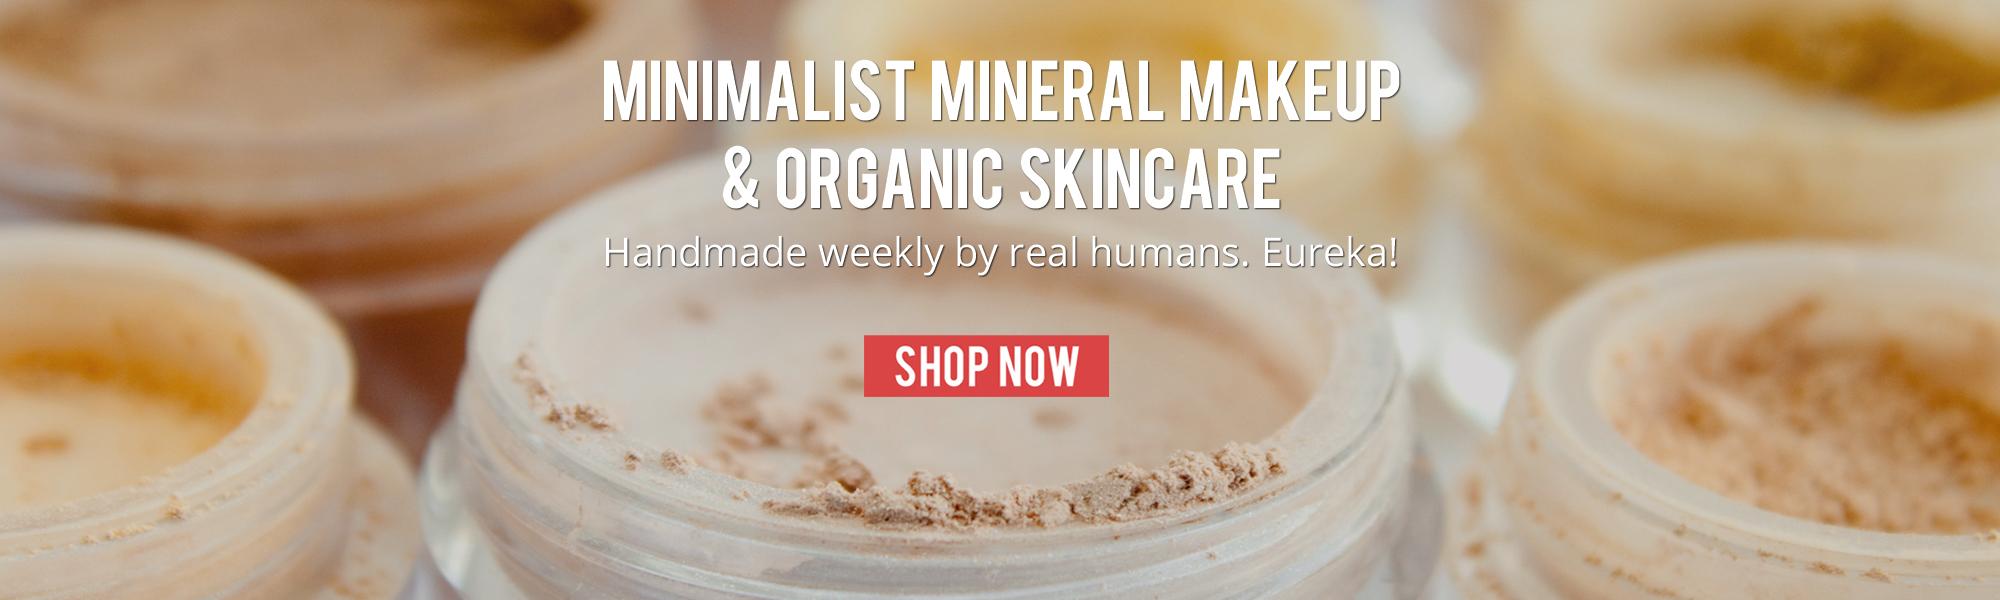 Minimalist mineral makeup and organic skincare.